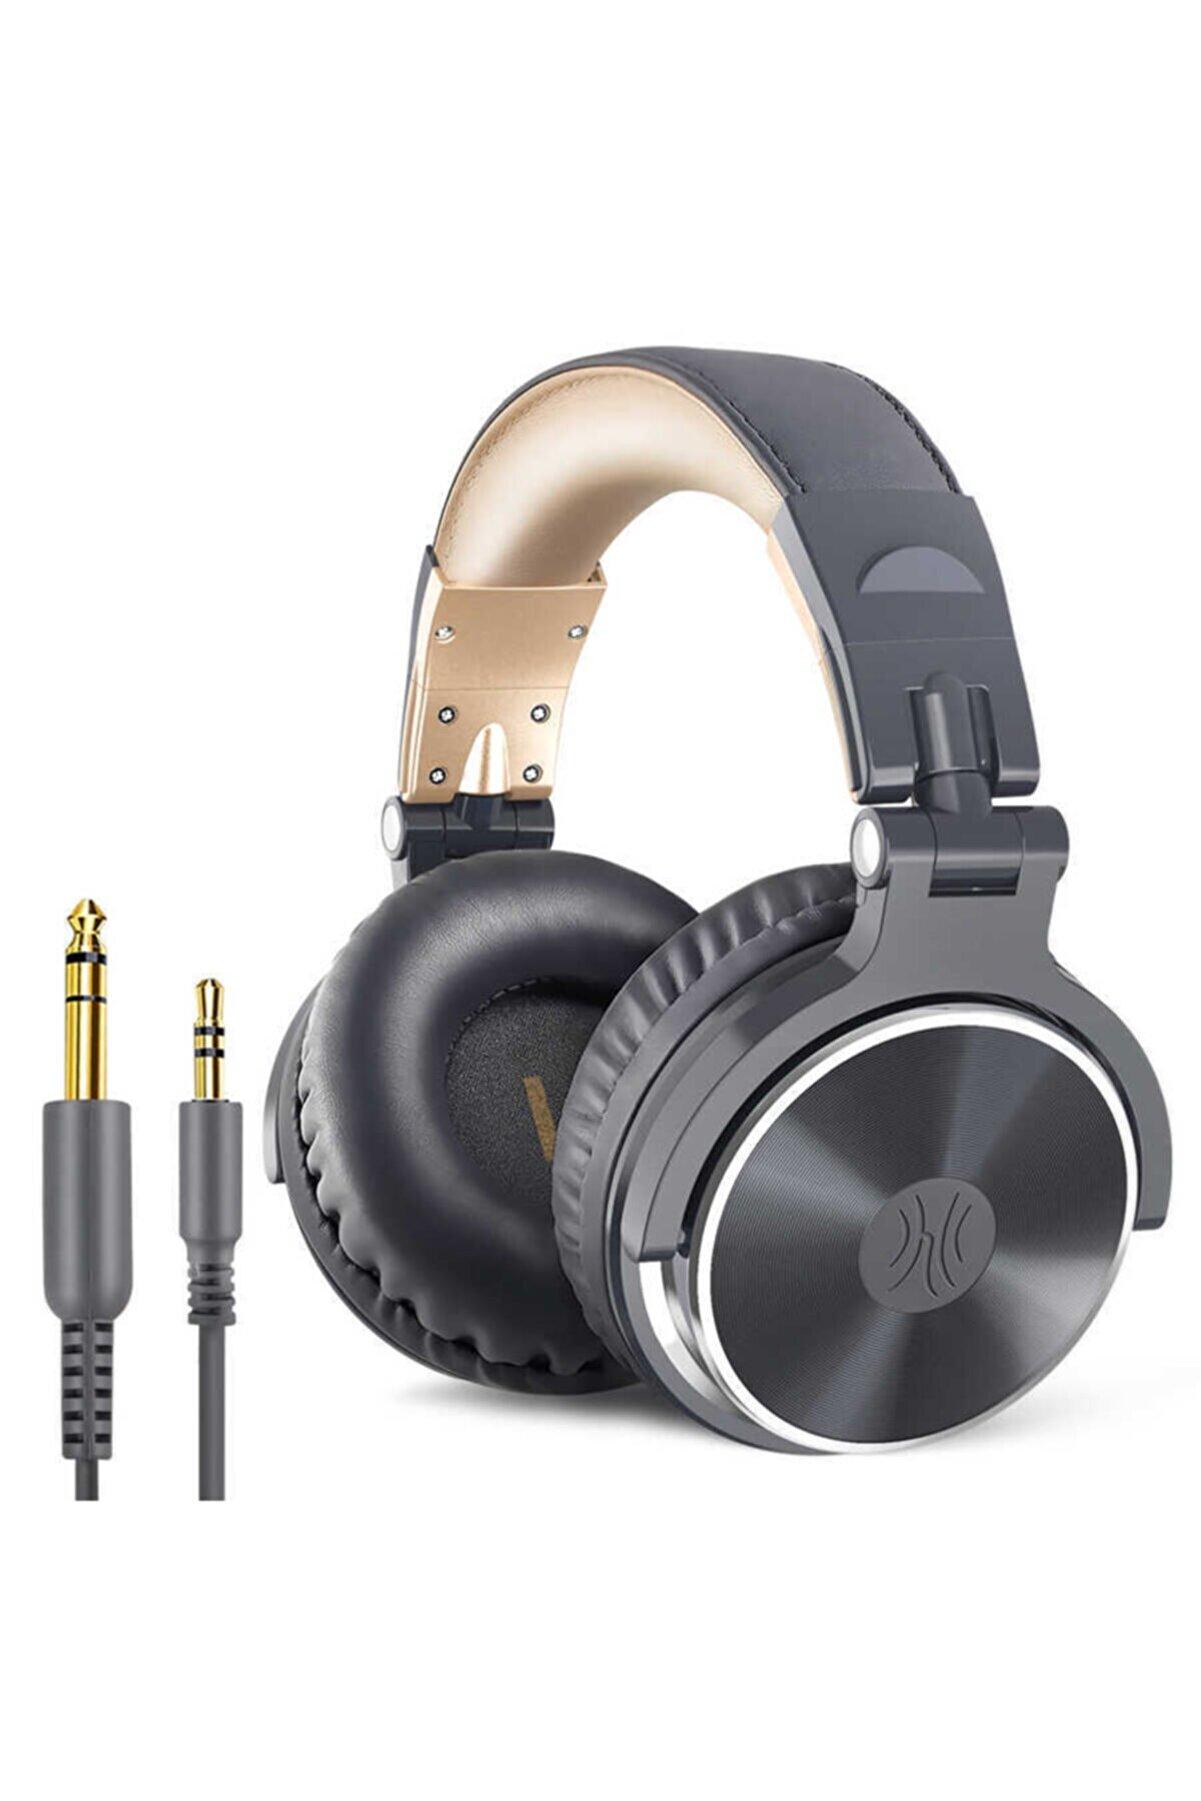 Zore Oneodio Pro 10 3.5mm Kulaklık